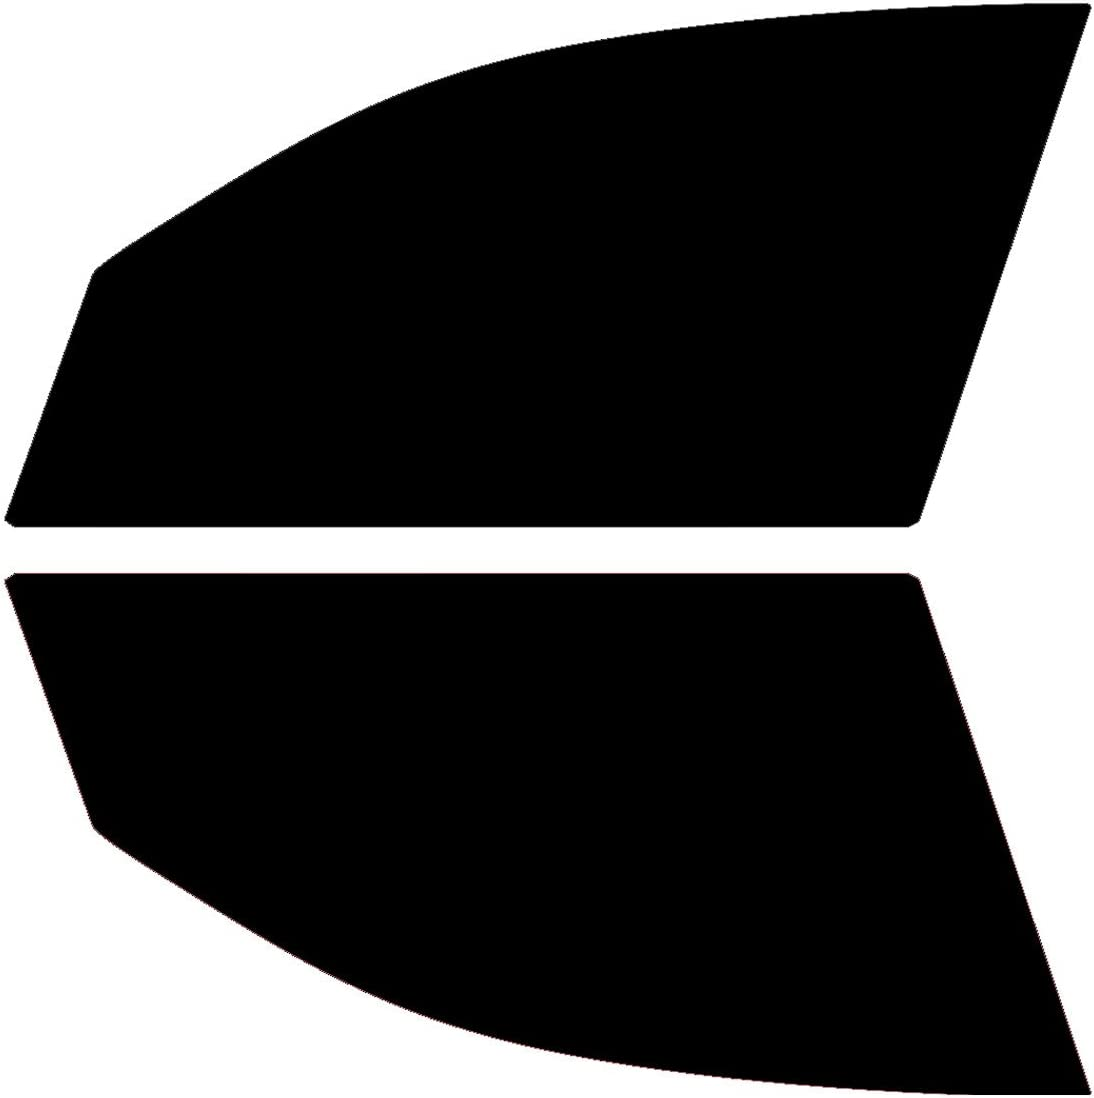 PSSC Pre Cut Front Car Window Films for BMW 1 Series 5 Door Hatchback 2004-2012 5/% Very Dark Limo Tint